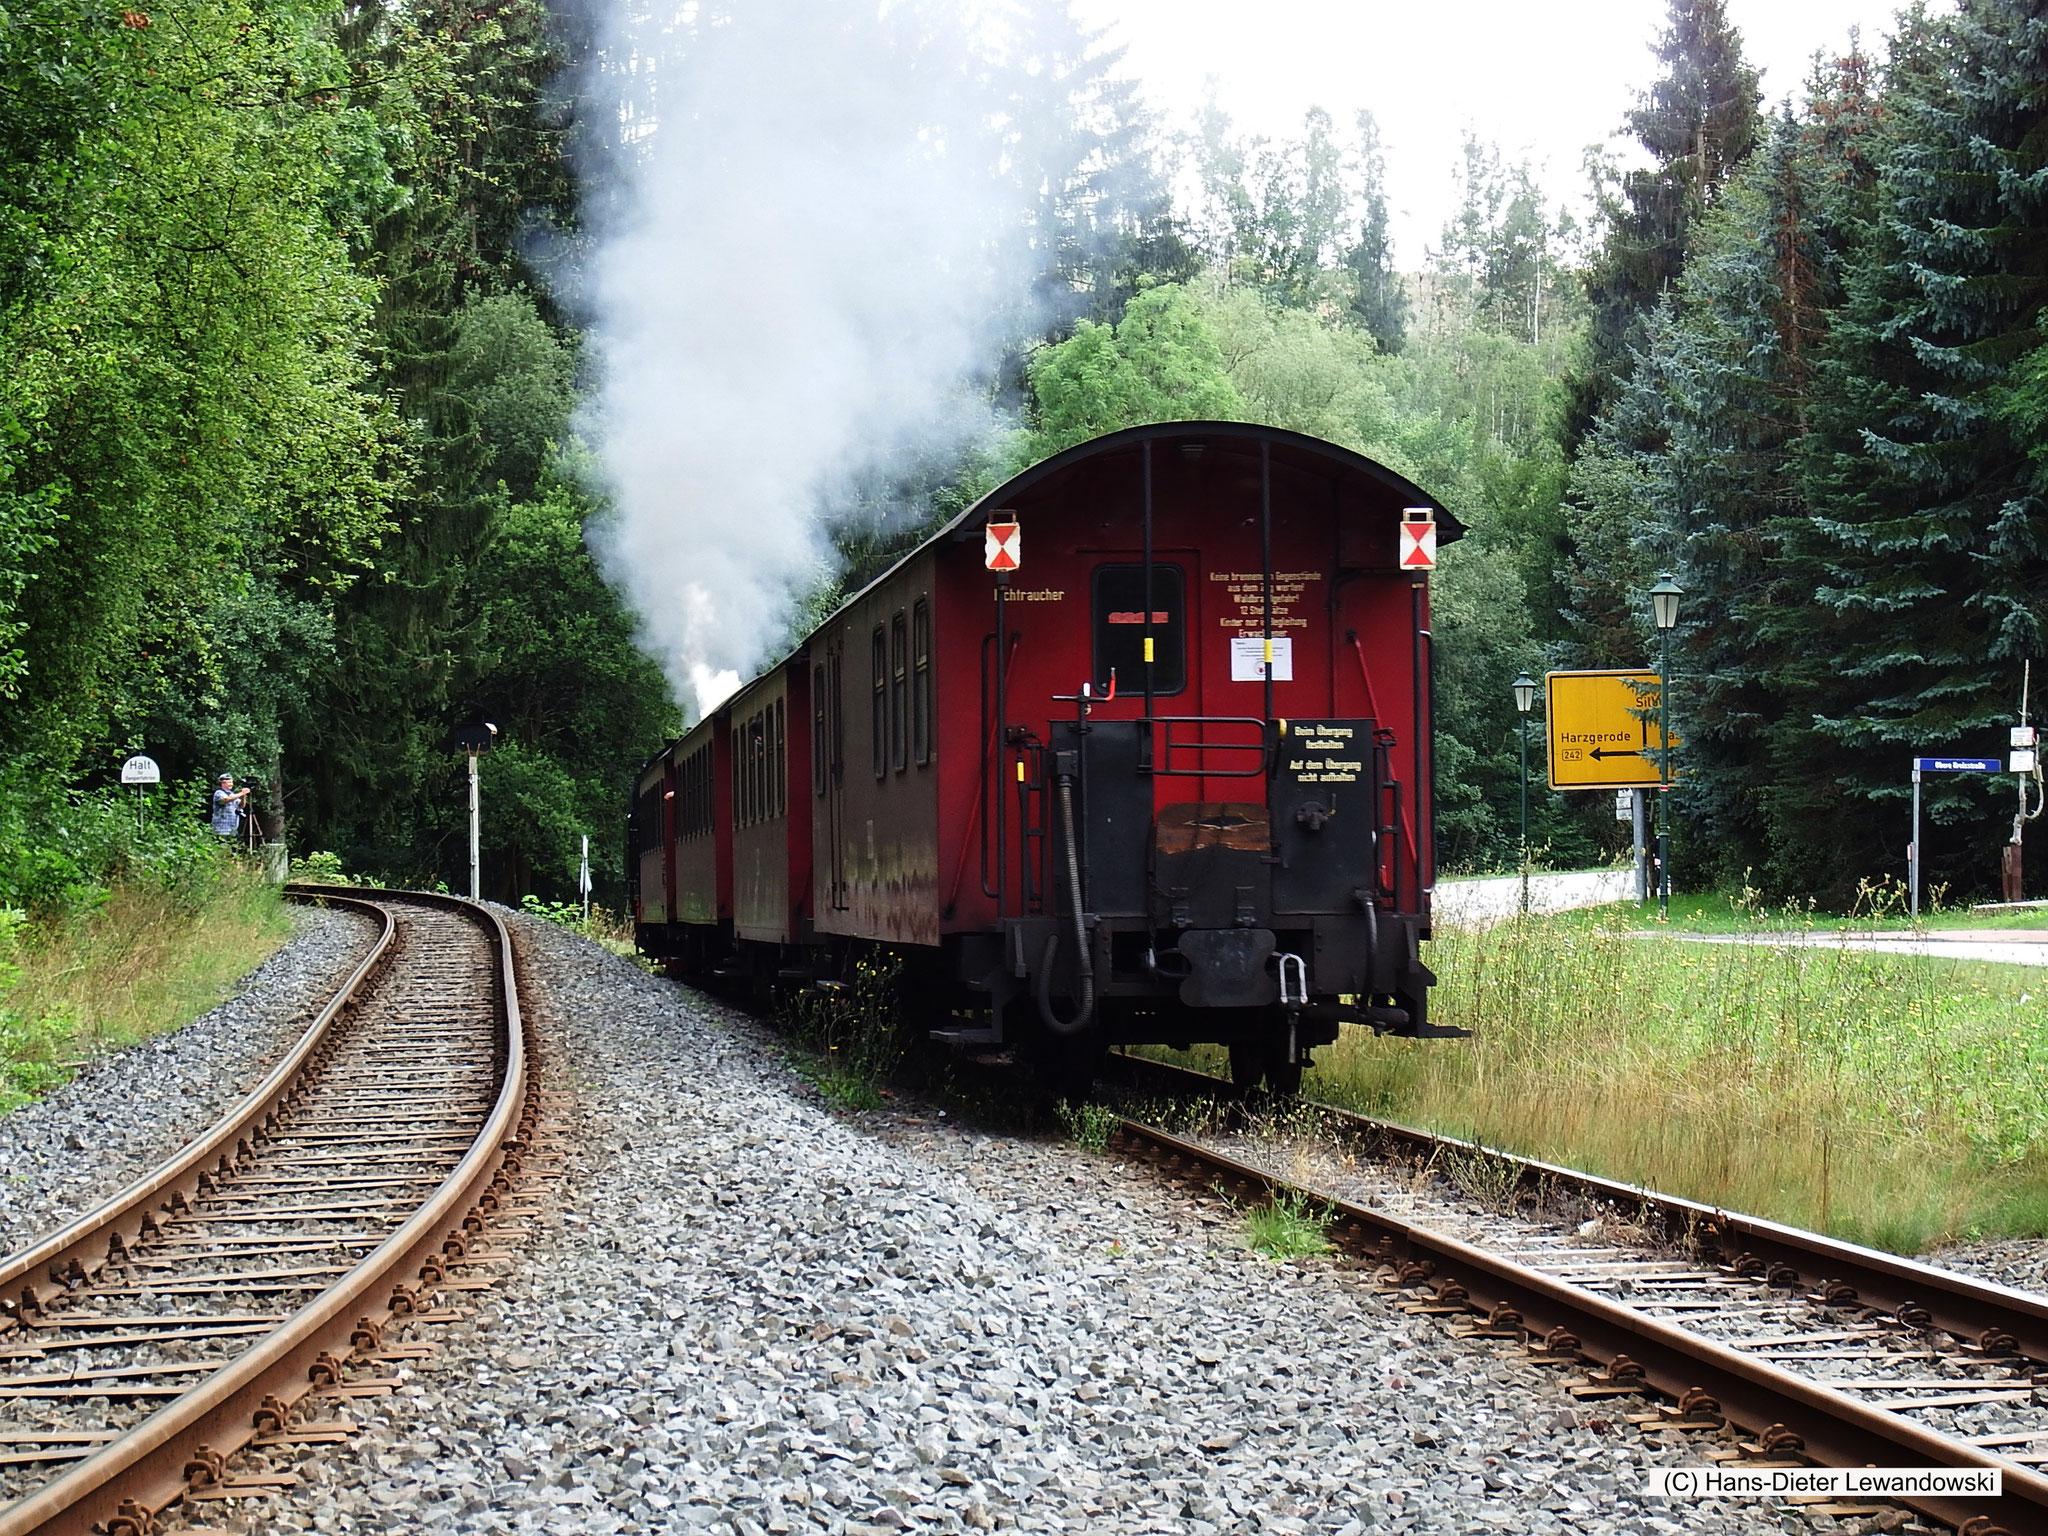 Bahnhof Alexisbad - Ausfahrt Richtung Hasselfelde